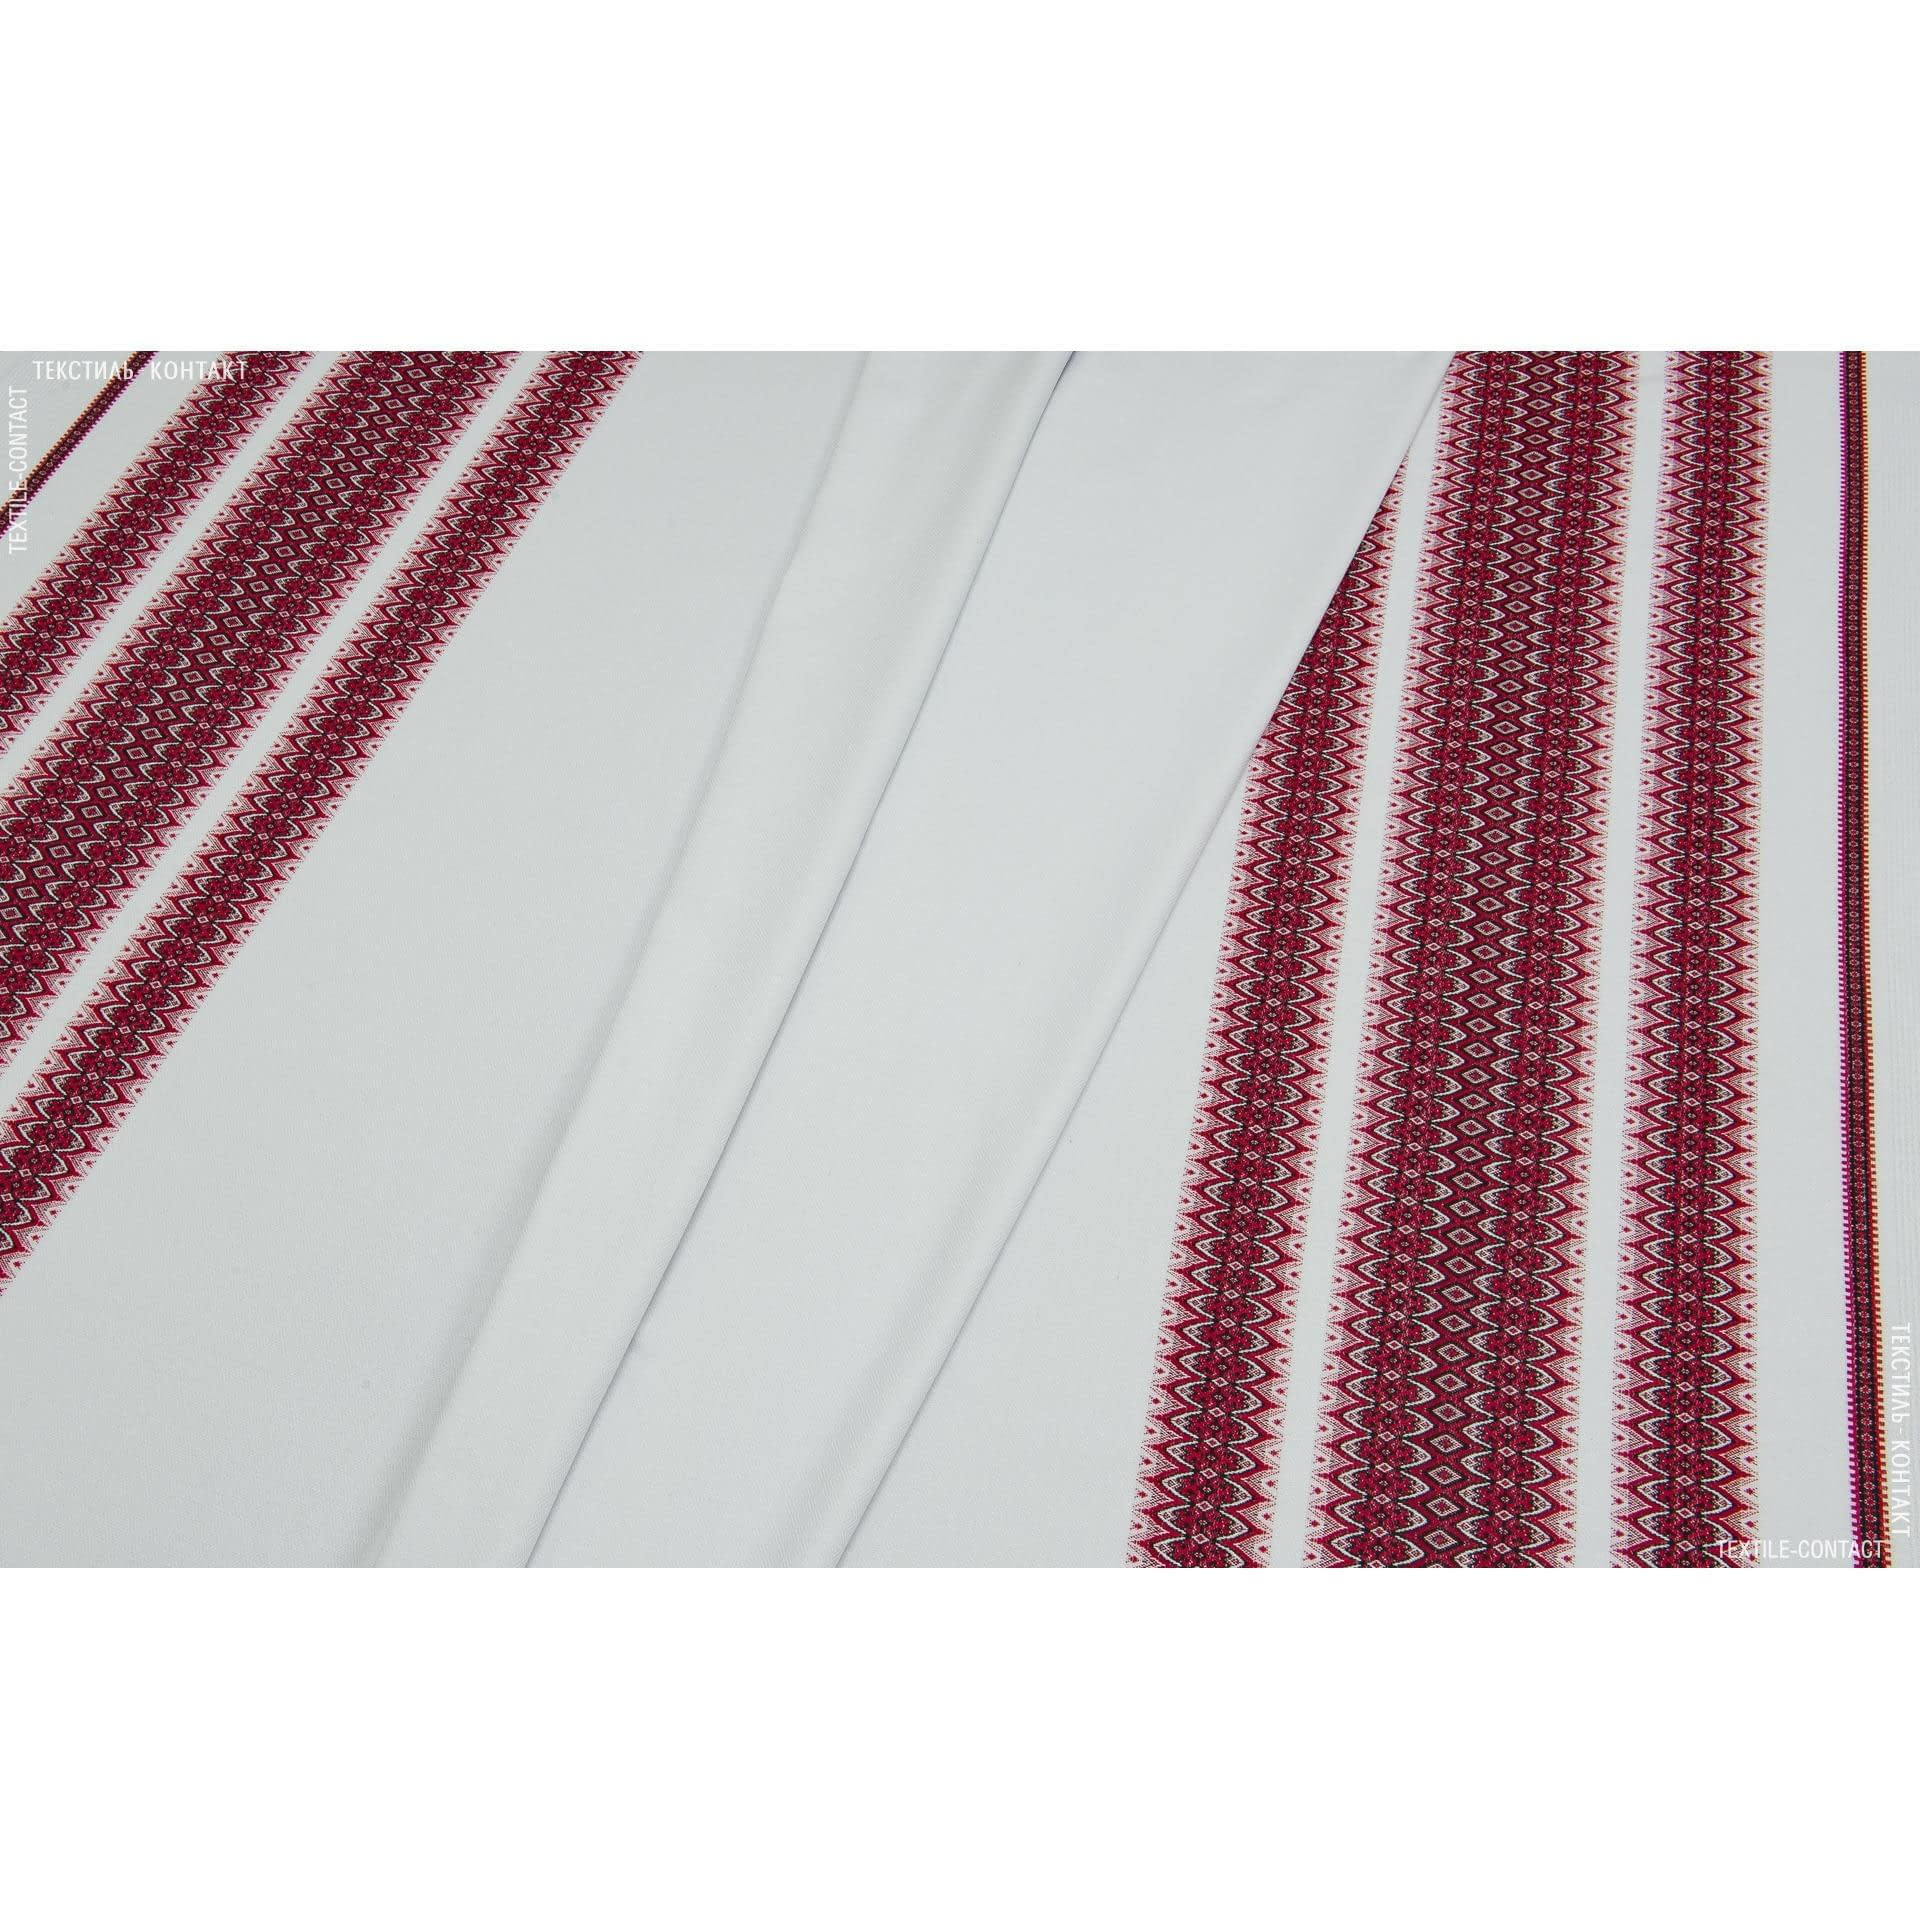 Ткани horeca - Ткань скатертная ТД-31